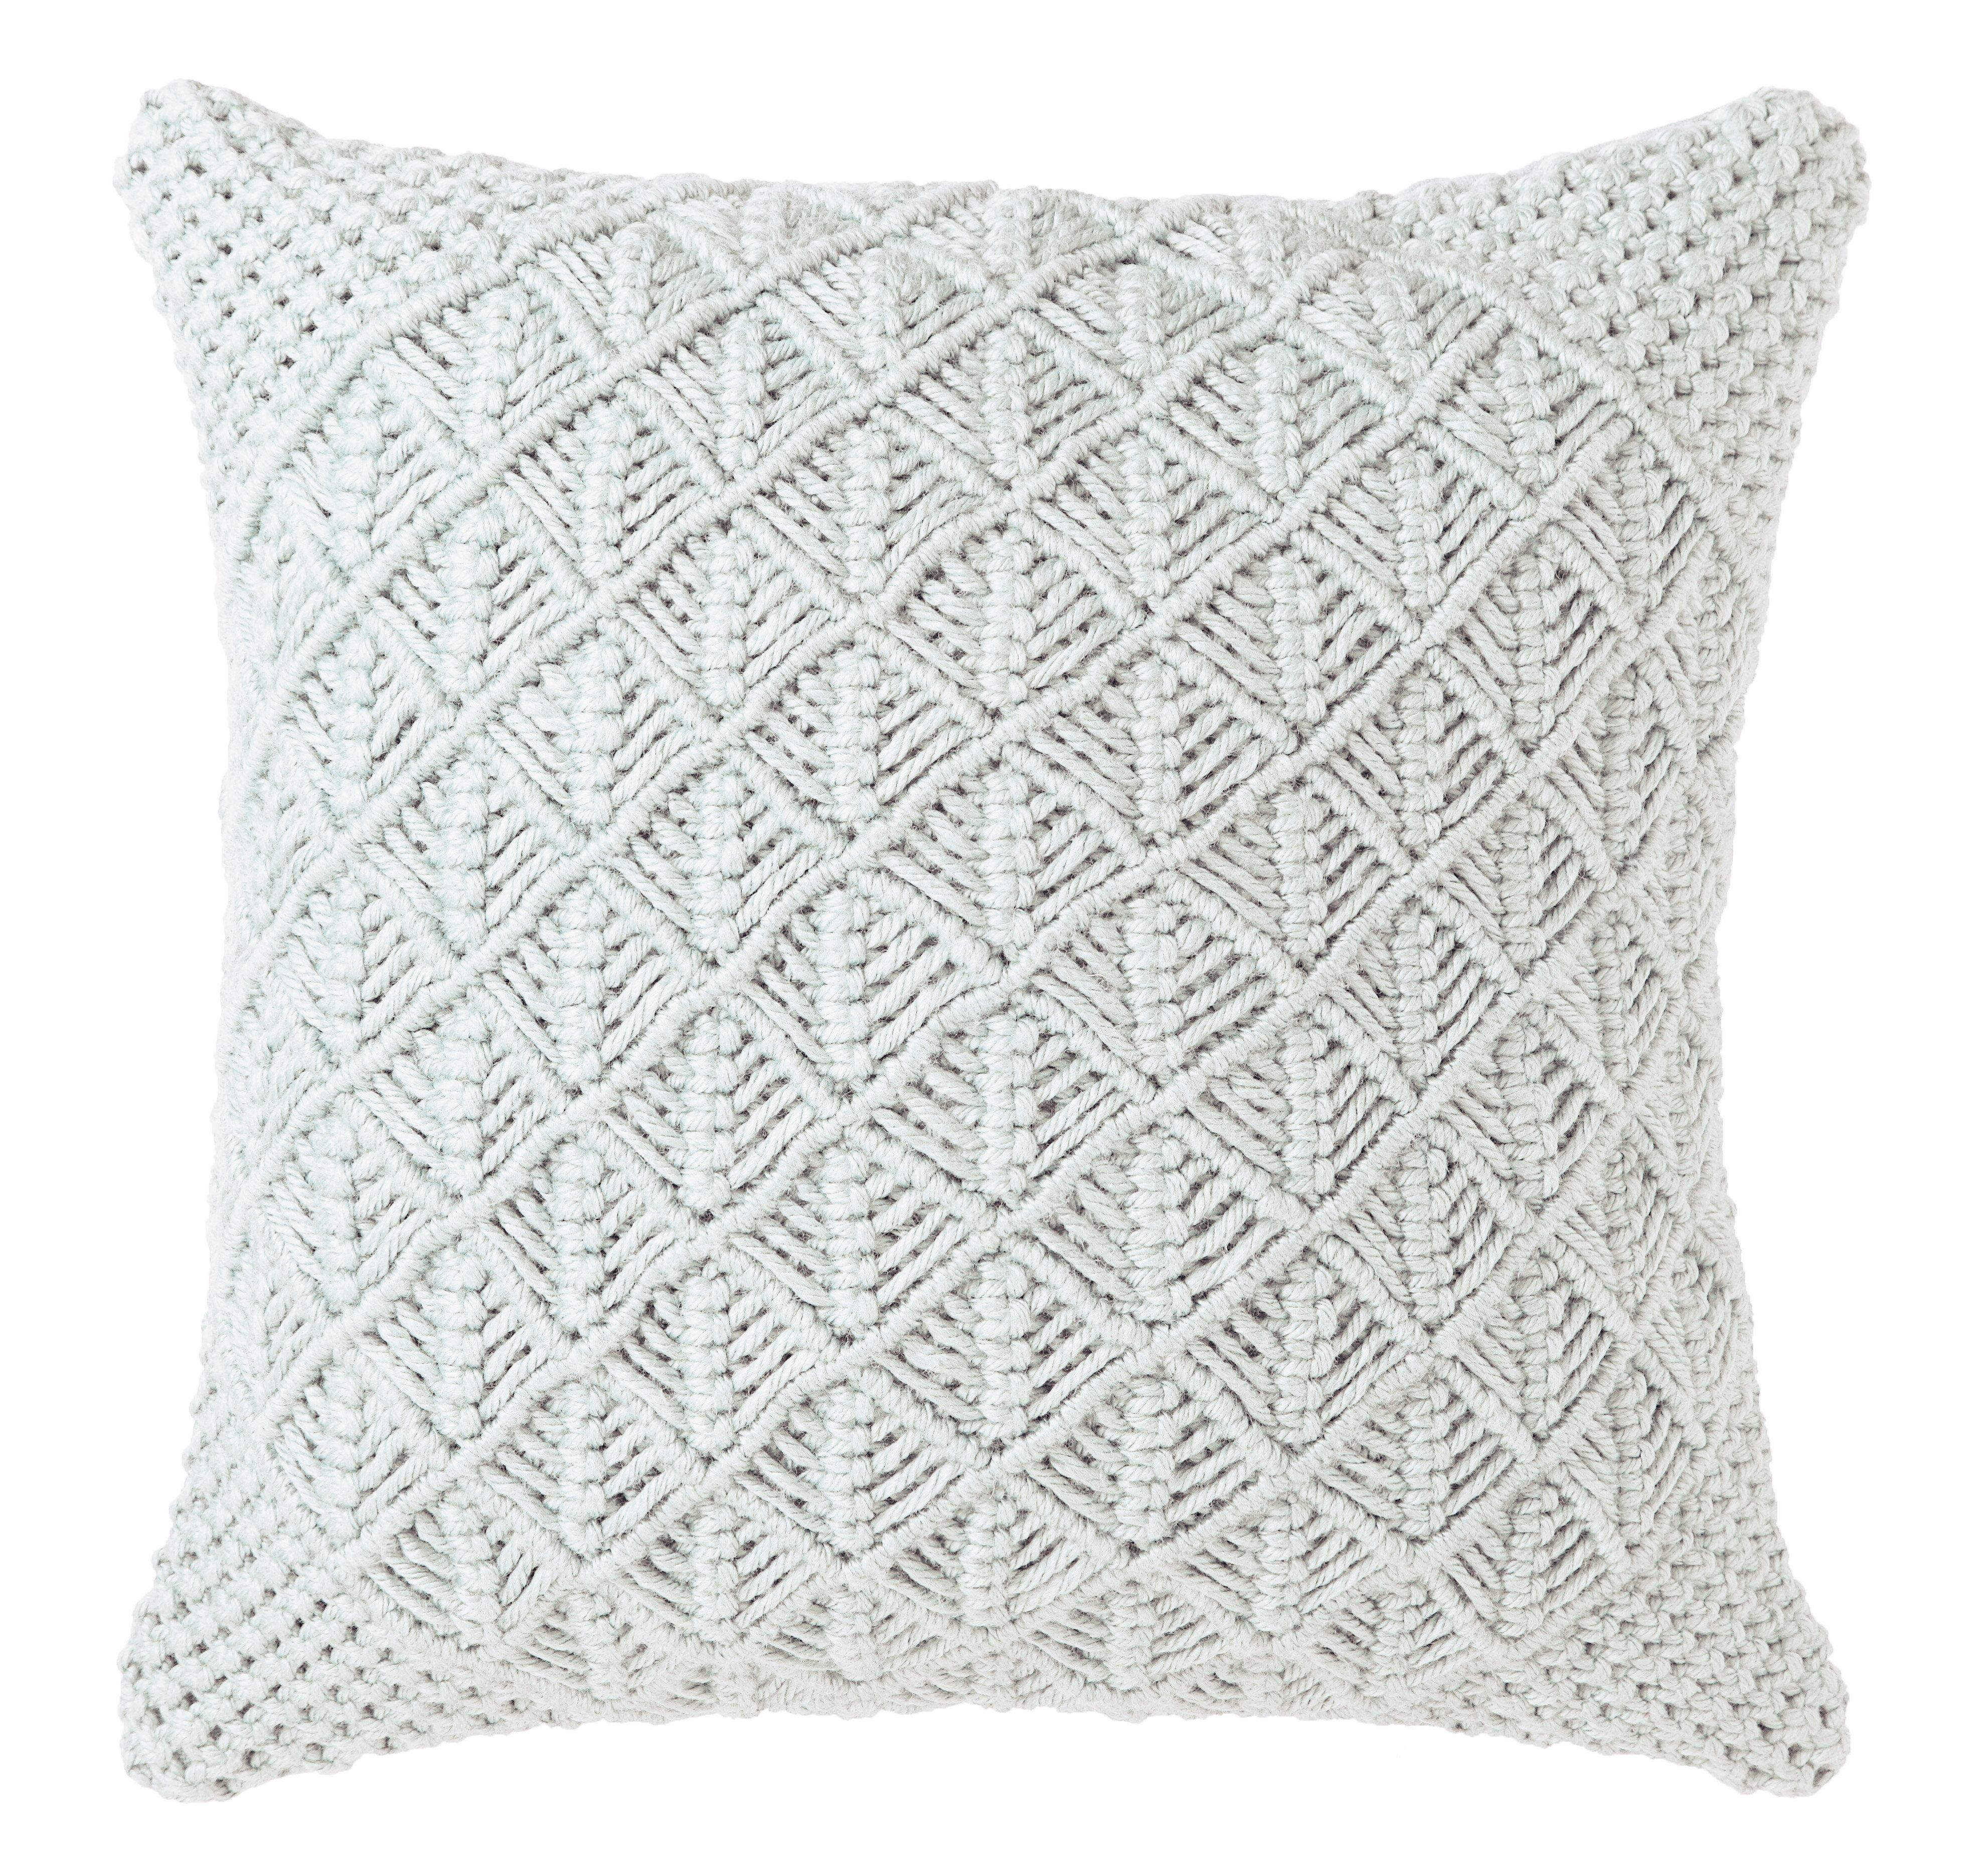 Modern Contemporary Companyc Throw Pillows You Ll Love In 2021 Wayfair